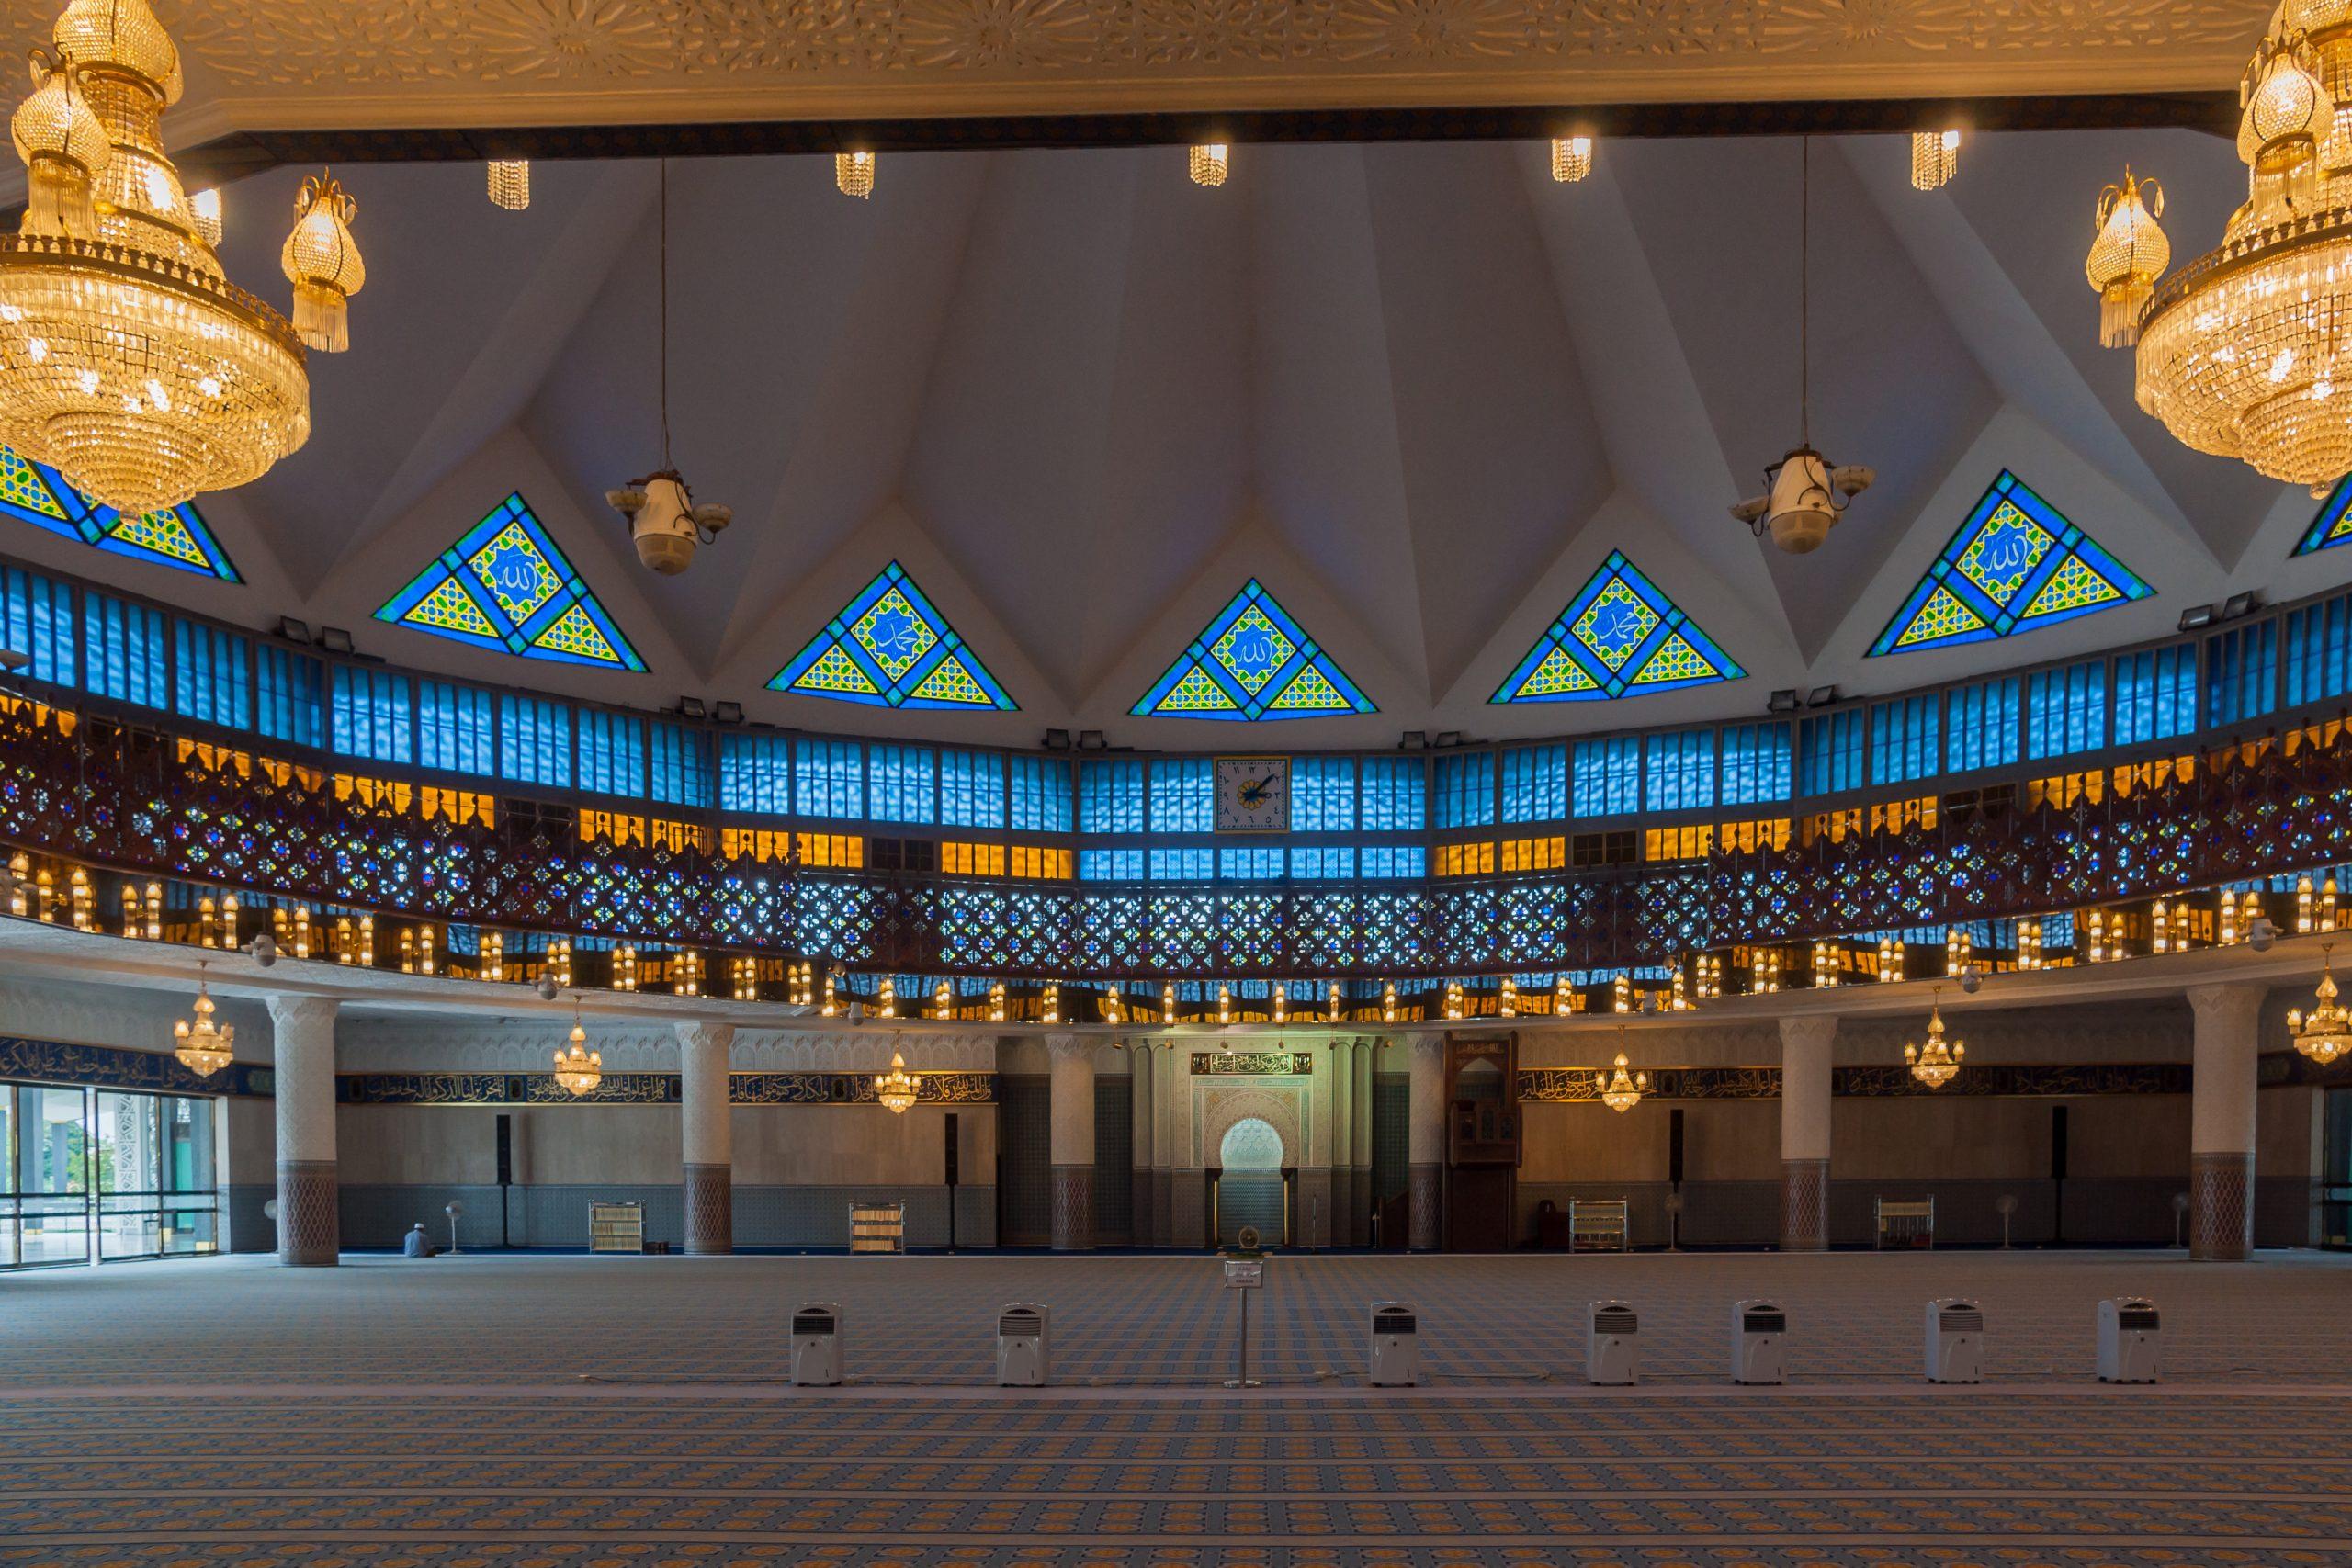 qué ver en Kuala Lumpur Masjid Negara